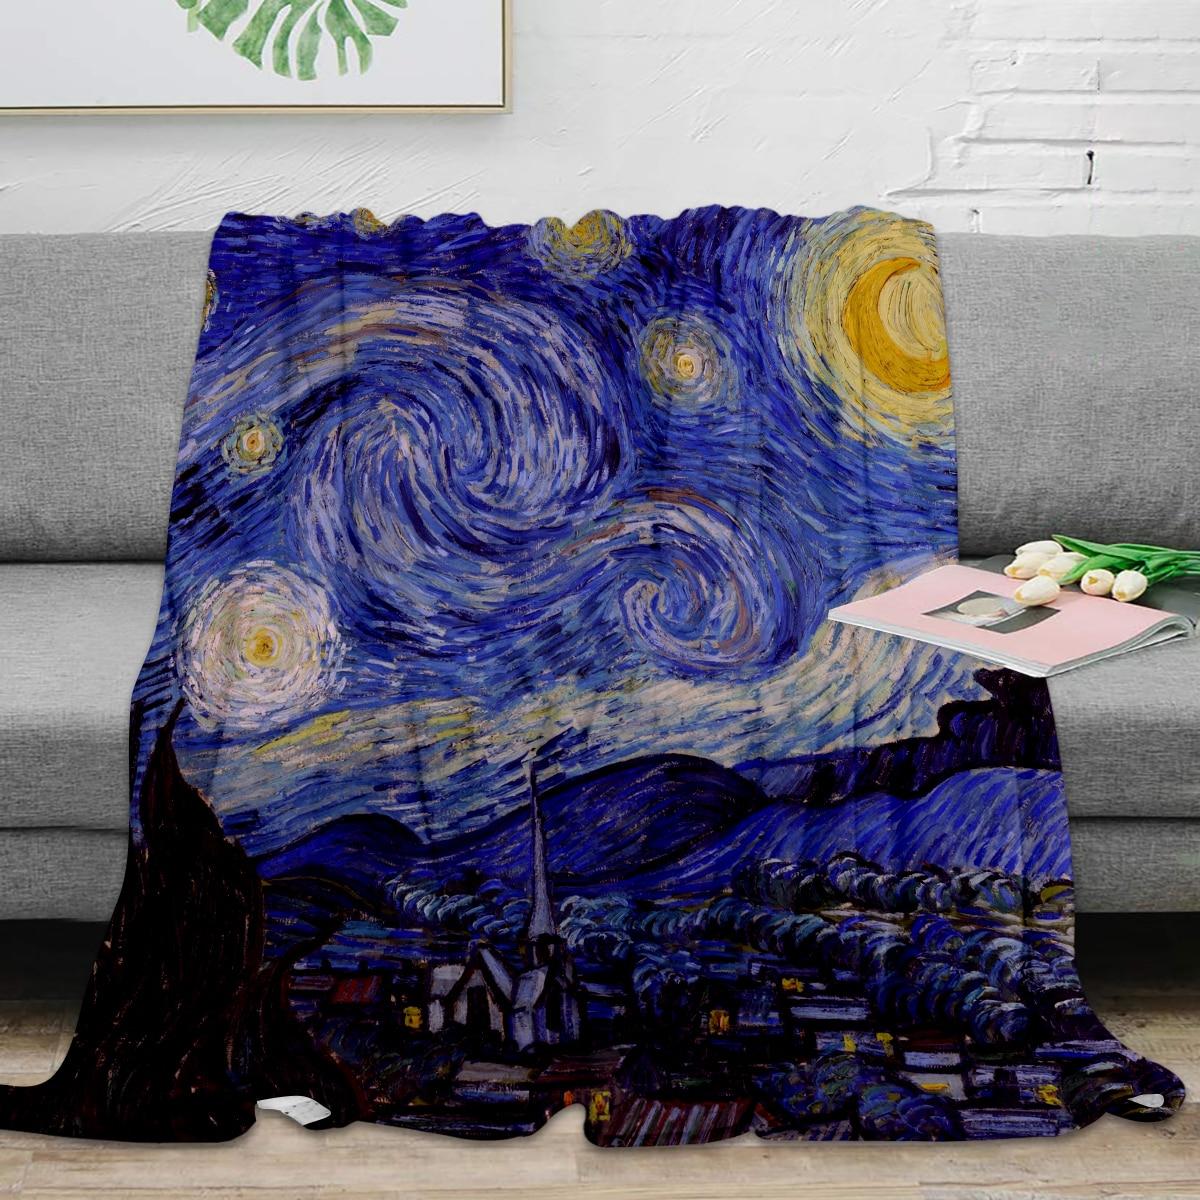 Starry Night Throw Blanket Vincent Van Gogh